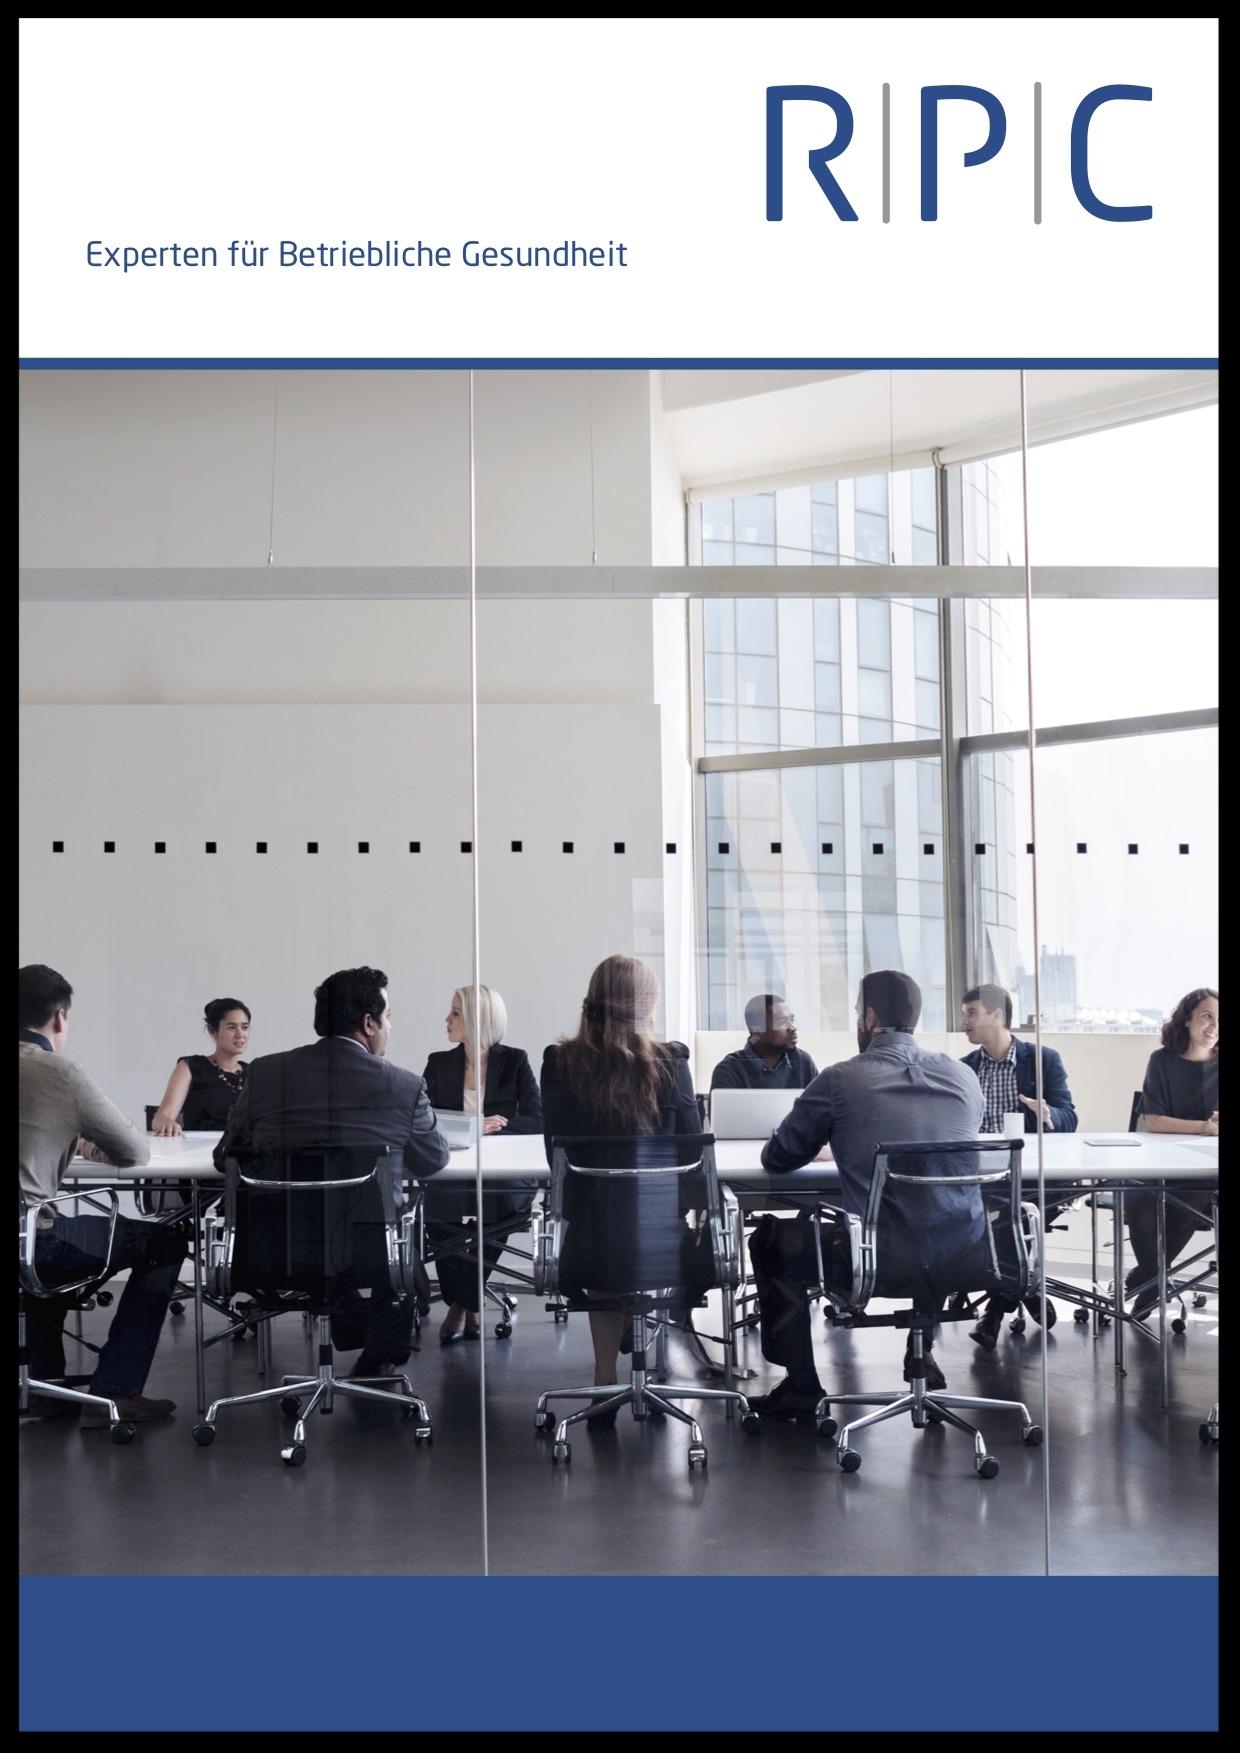 RPC Consulting GmbH Unternehmensbroschüre